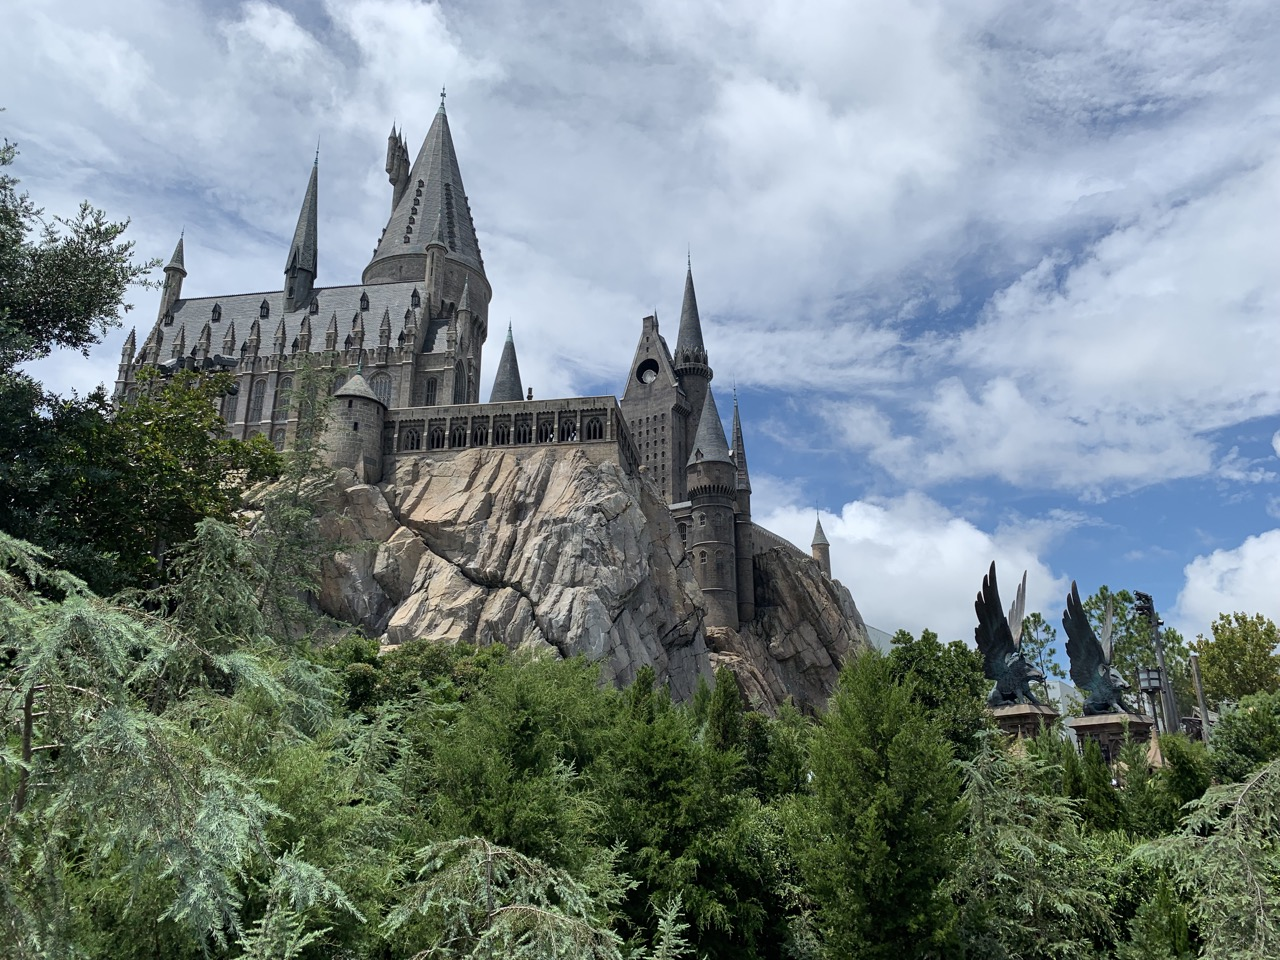 universal studios orlando trip vacation planinng guide 02 hogwarts.jpeg